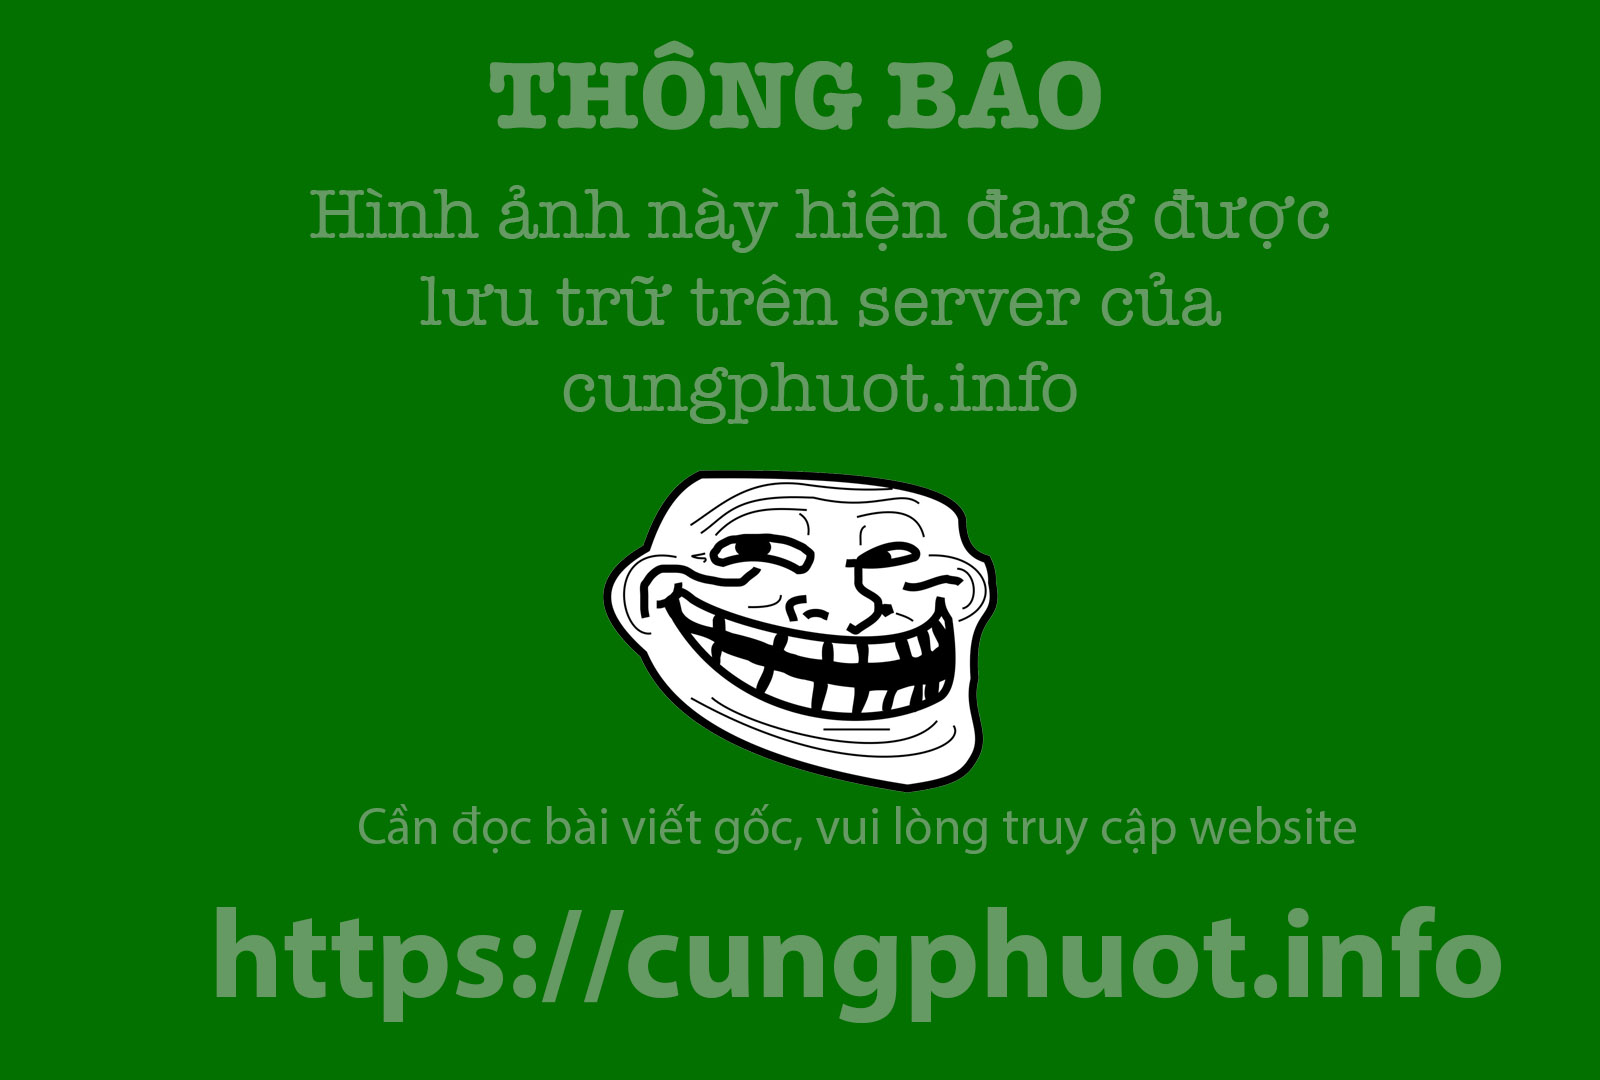 Mua he ve Con Dao ngam bien troi xanh ngat hinh anh 8